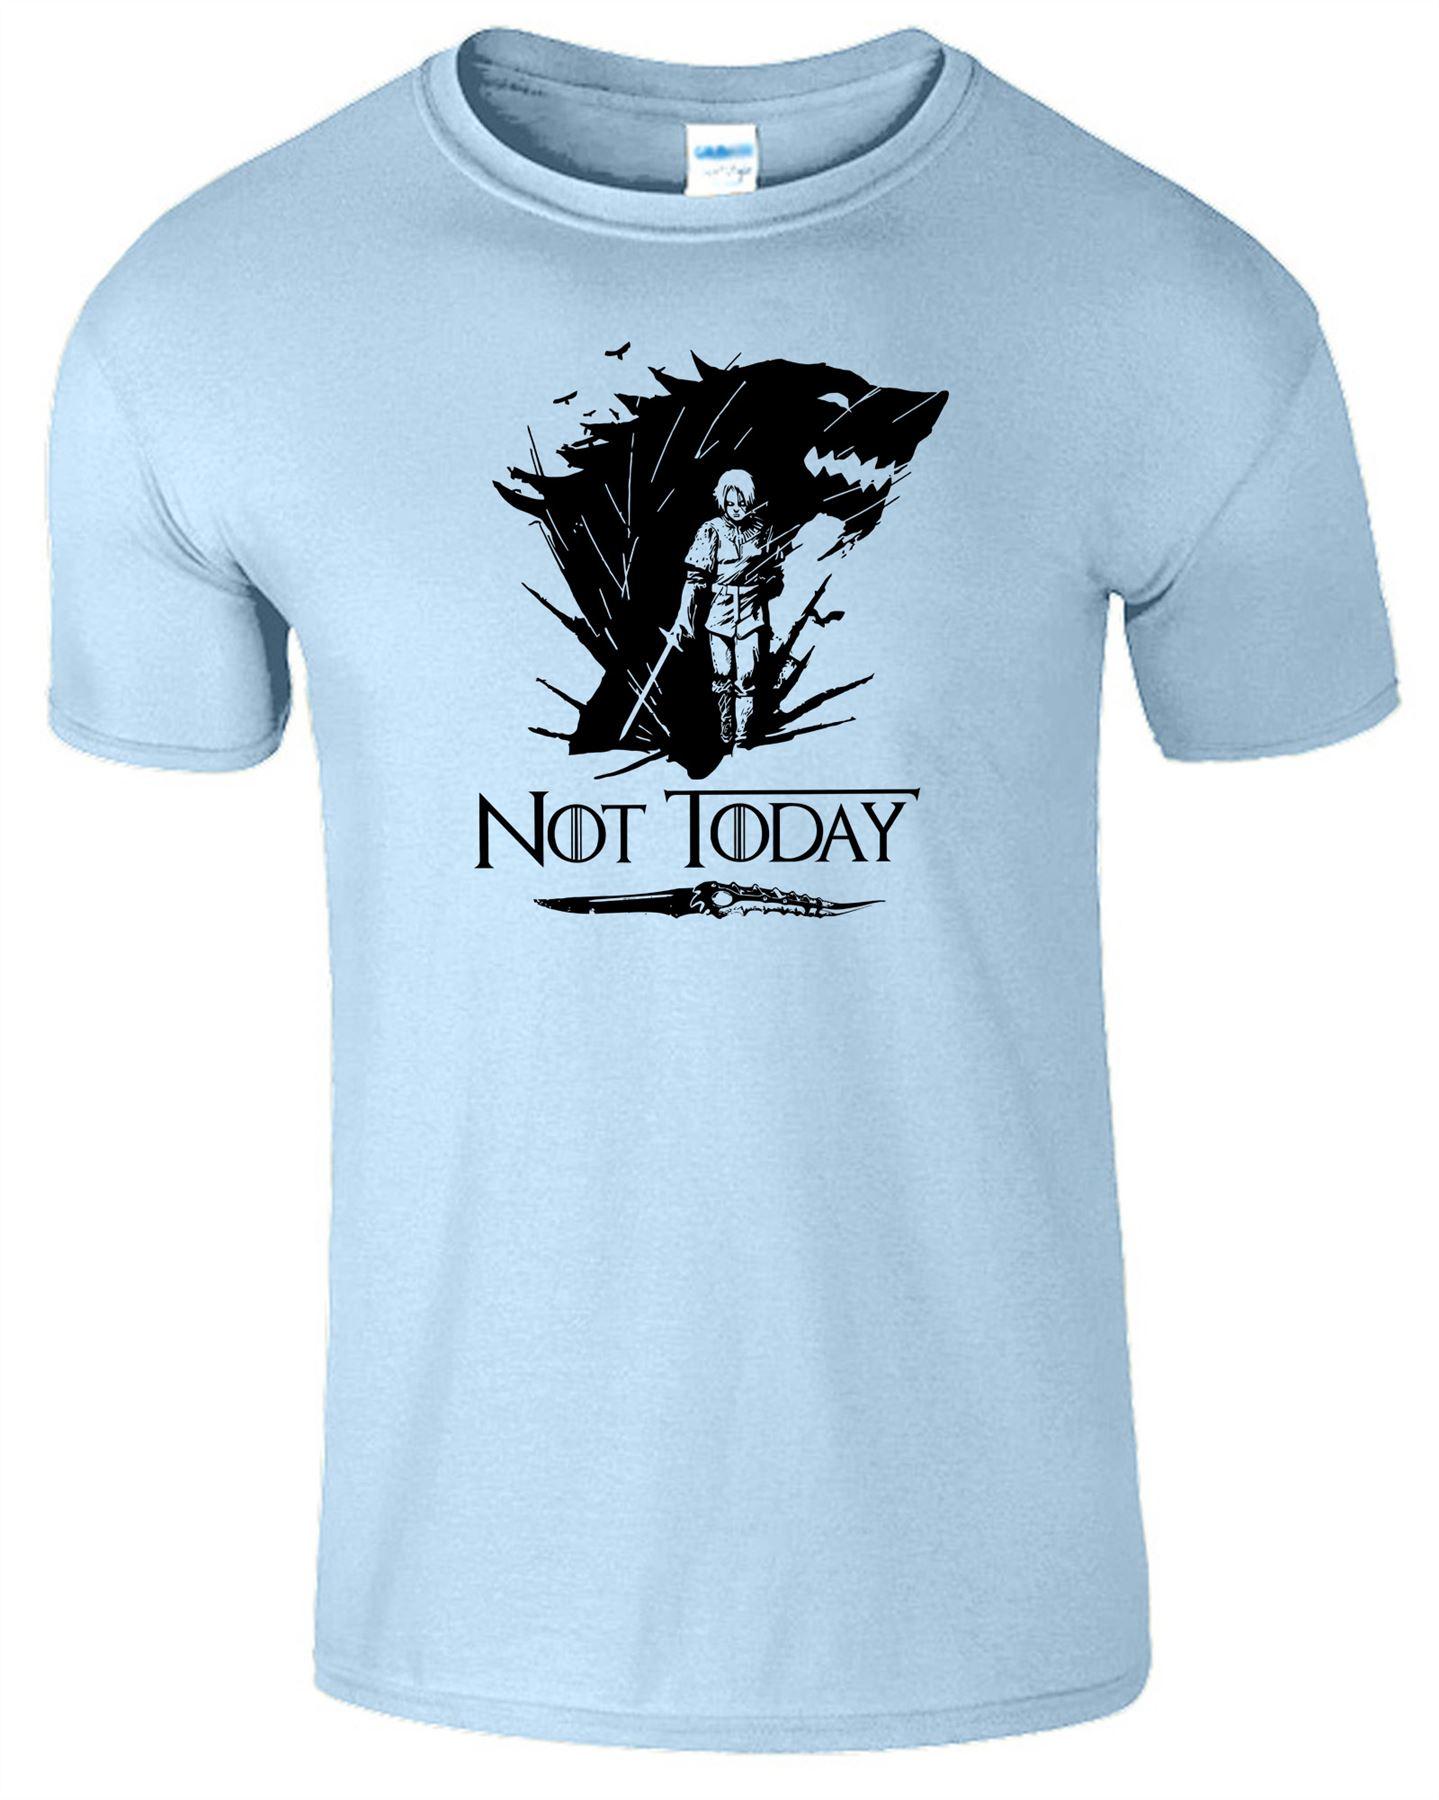 Arya-Stark-Not-Today-T-Shirt-Mens-Game-Season-Womens-Shirt-Adults-Unisex-Fit Indexbild 27